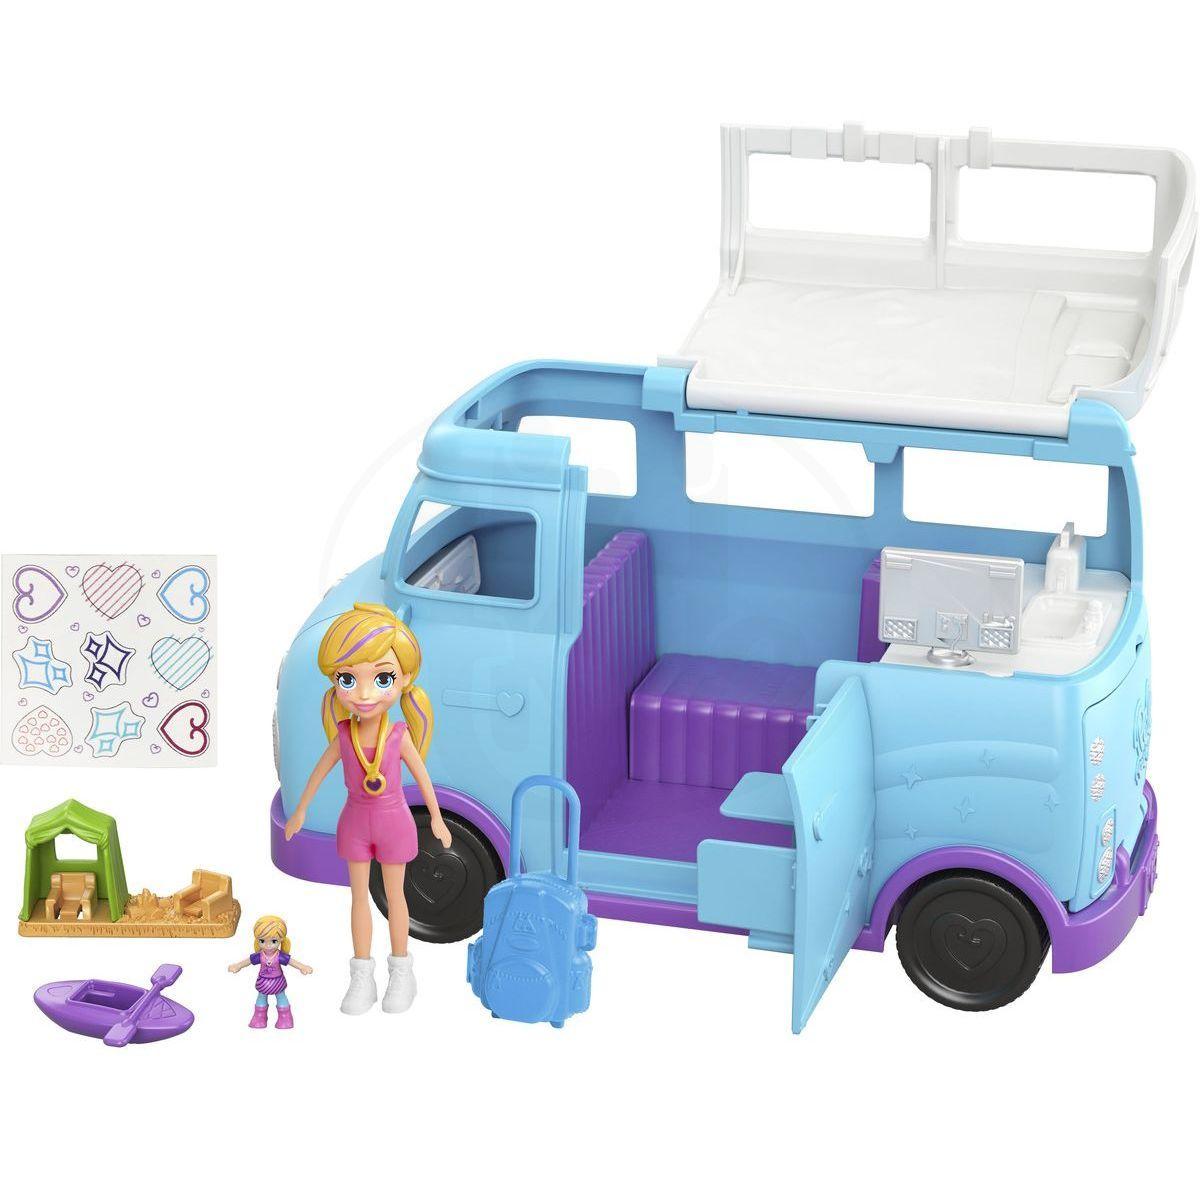 Mattel Polly Pocket karavan